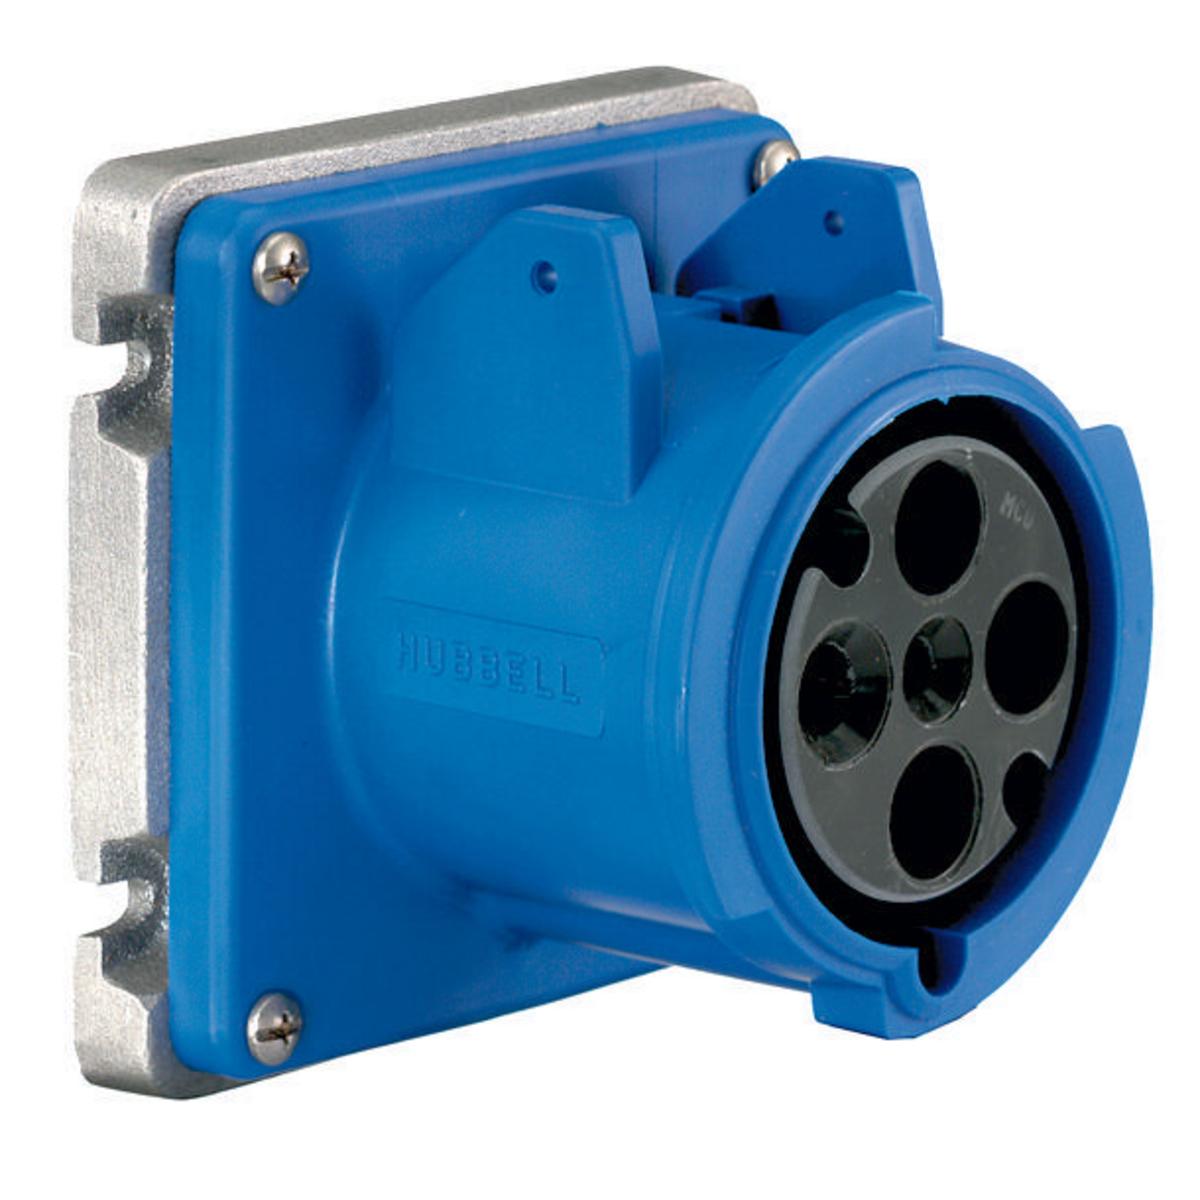 HUBA4100R9 PS, IEC, RECP, 3P4W, 100A 3P 250V, LOPRO ,A4100R9, HUBBELL